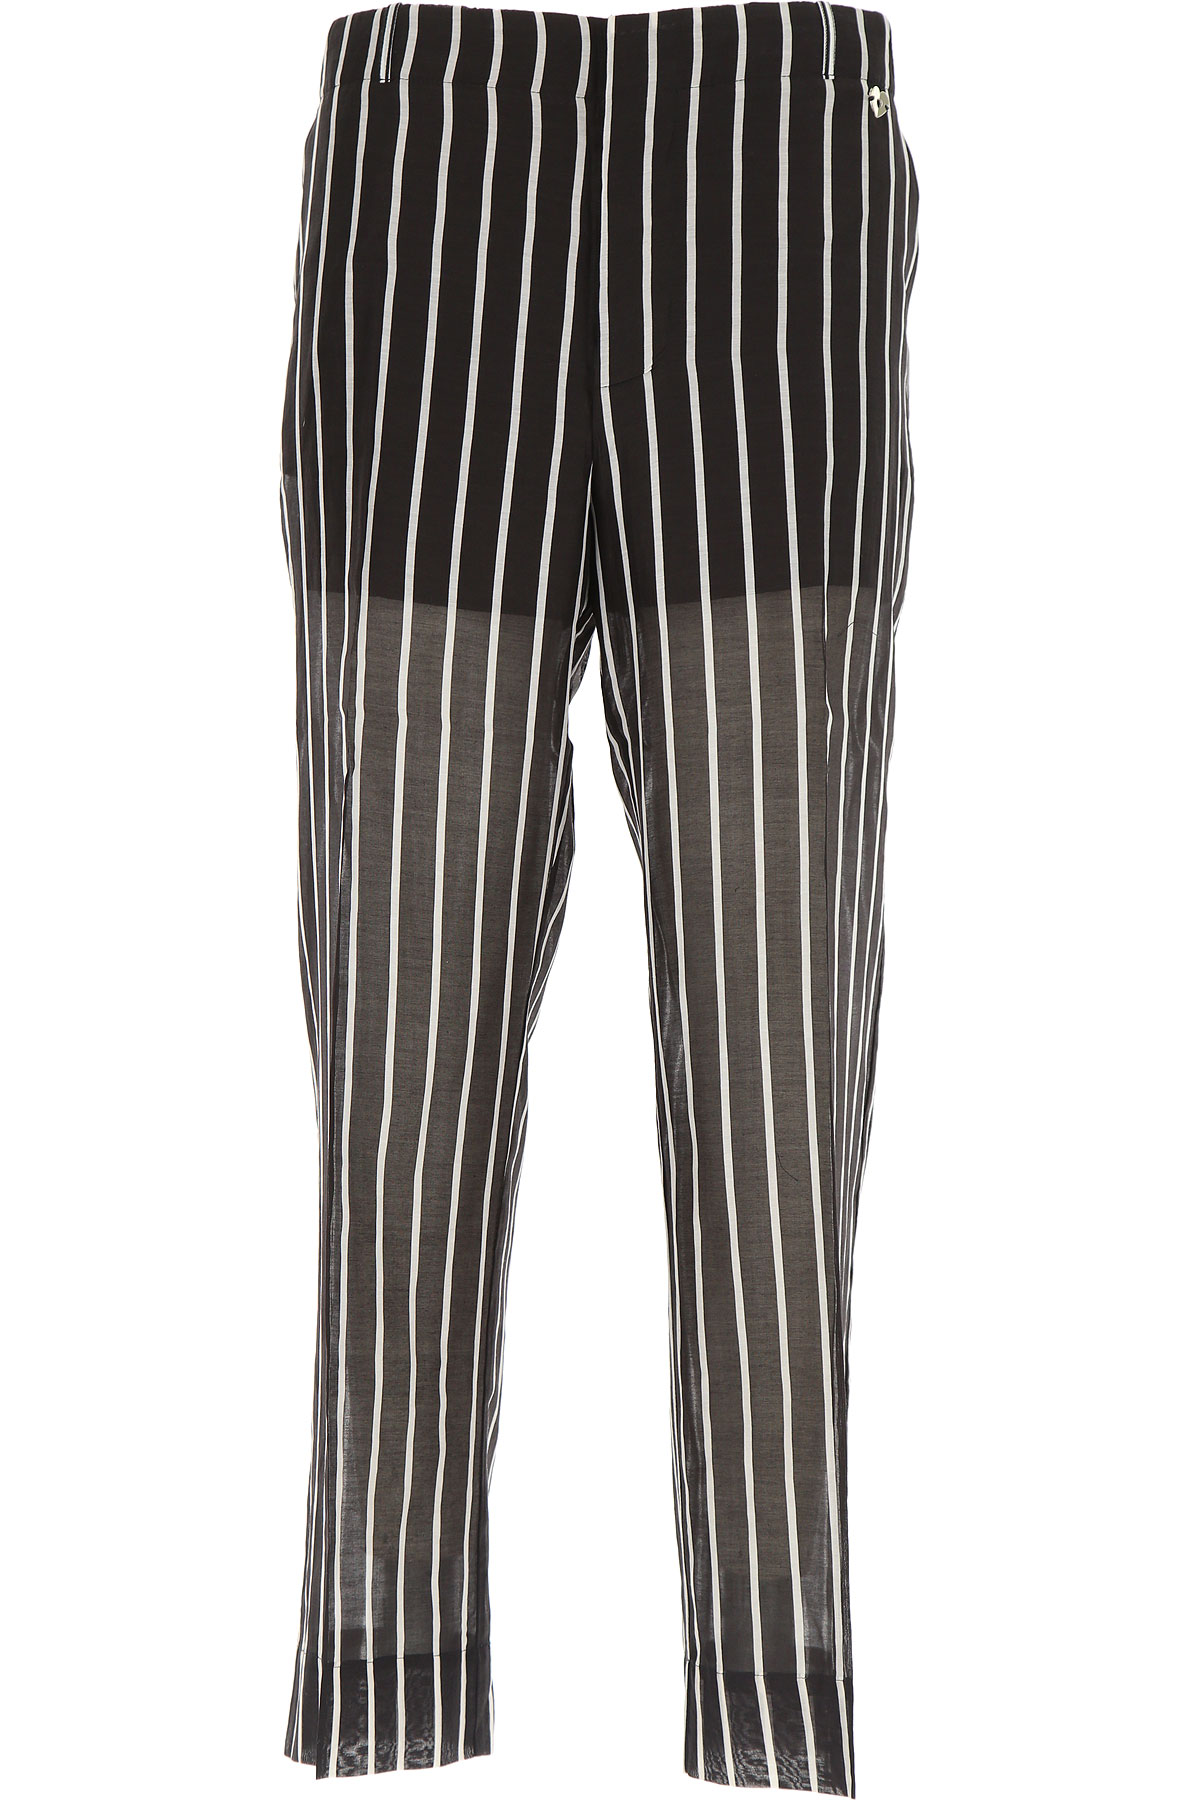 Twin Set by Simona Barbieri Pantalon Femme, Noir, Coton, 2017, 40 40 42 42 44 44 46 46